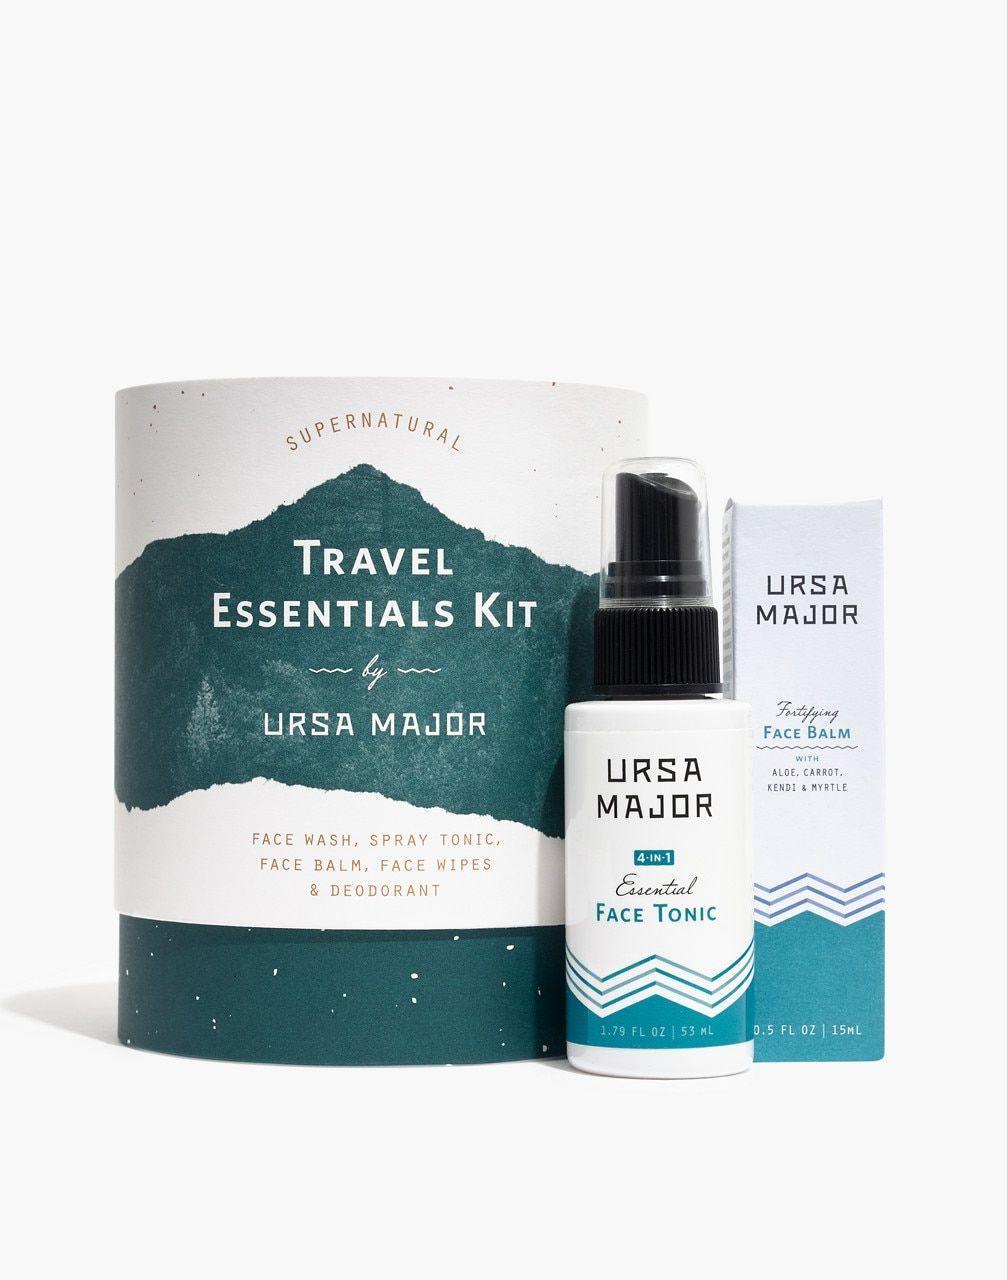 Ursa Major Traveler Skin Care Kit Skincarekit Madewell Ursa Major Traveler Skin Care Kit In Gift Set Size One S Skin Care Organic Skin Care Deodorant